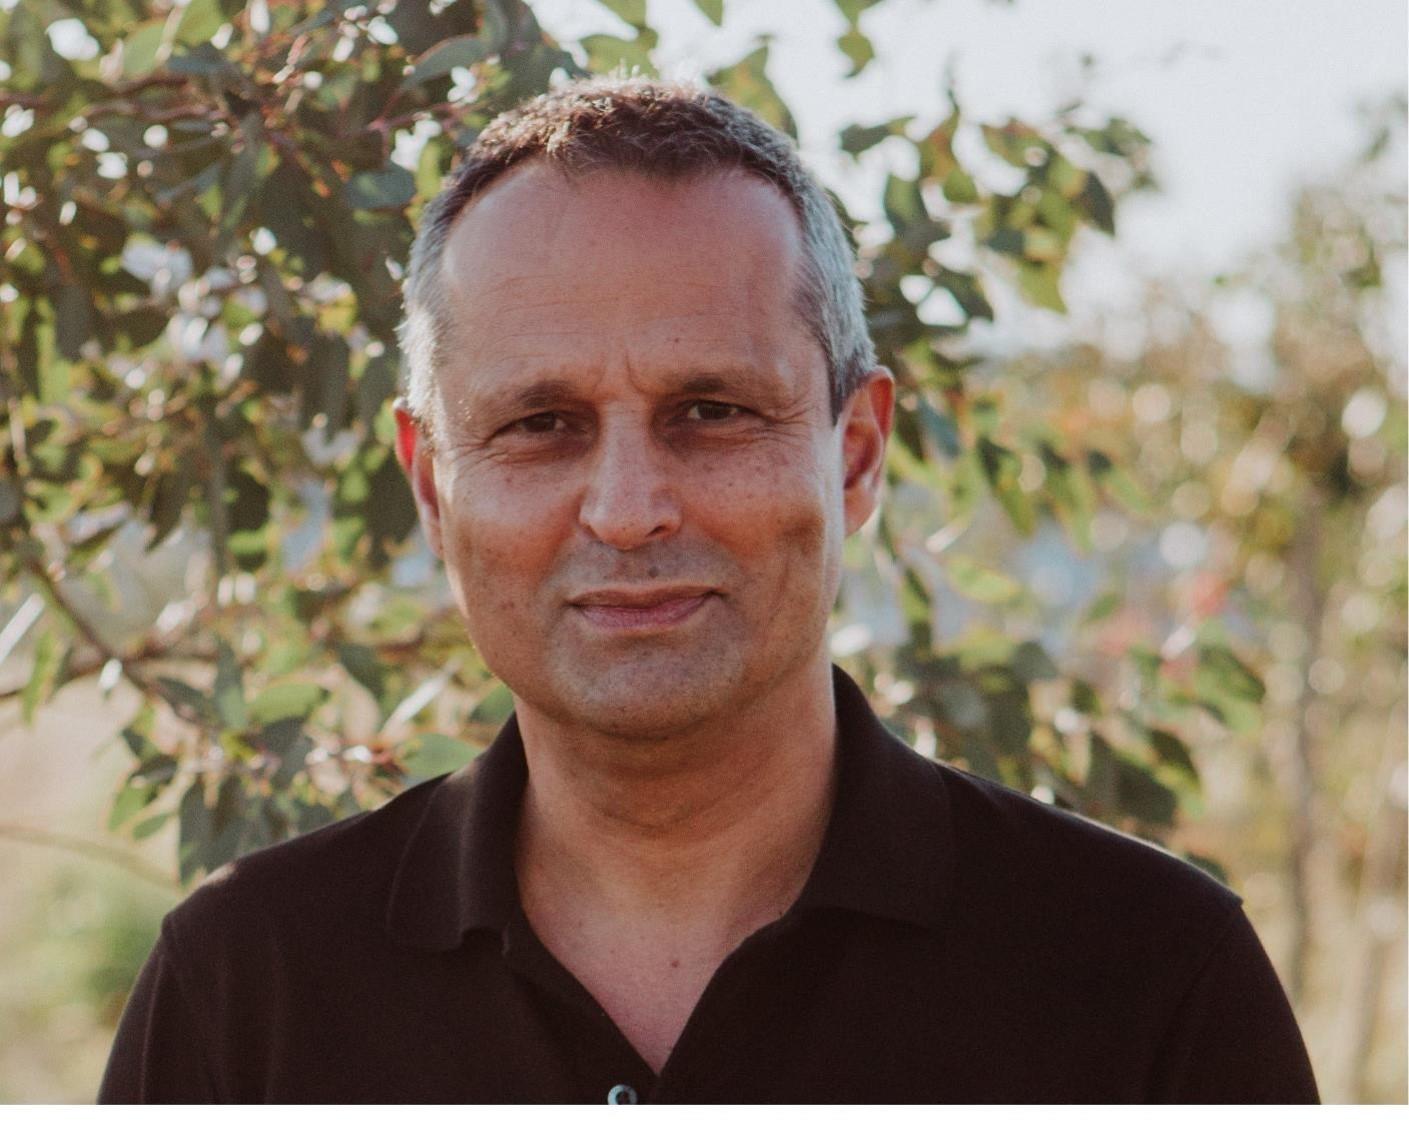 Jawahar Bhalla